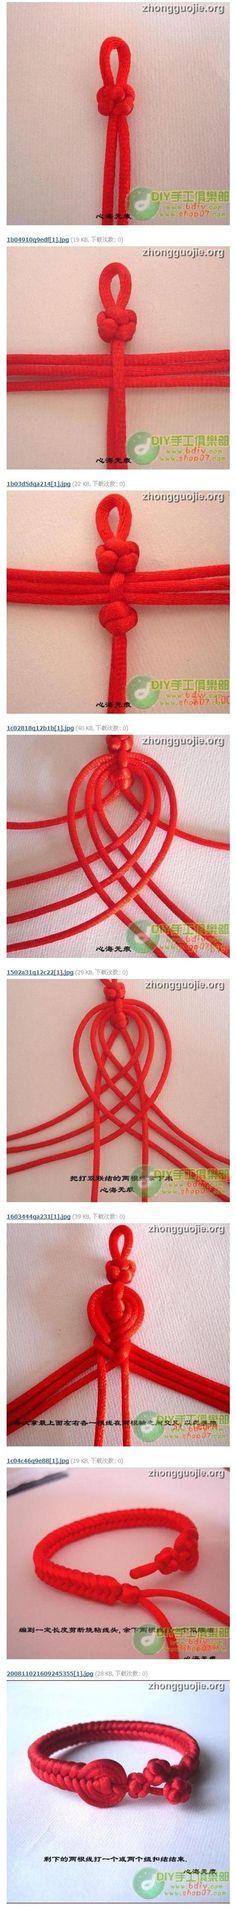 DIY Lucky knot Bracelet http://weheartit.com/entry/group/21103474